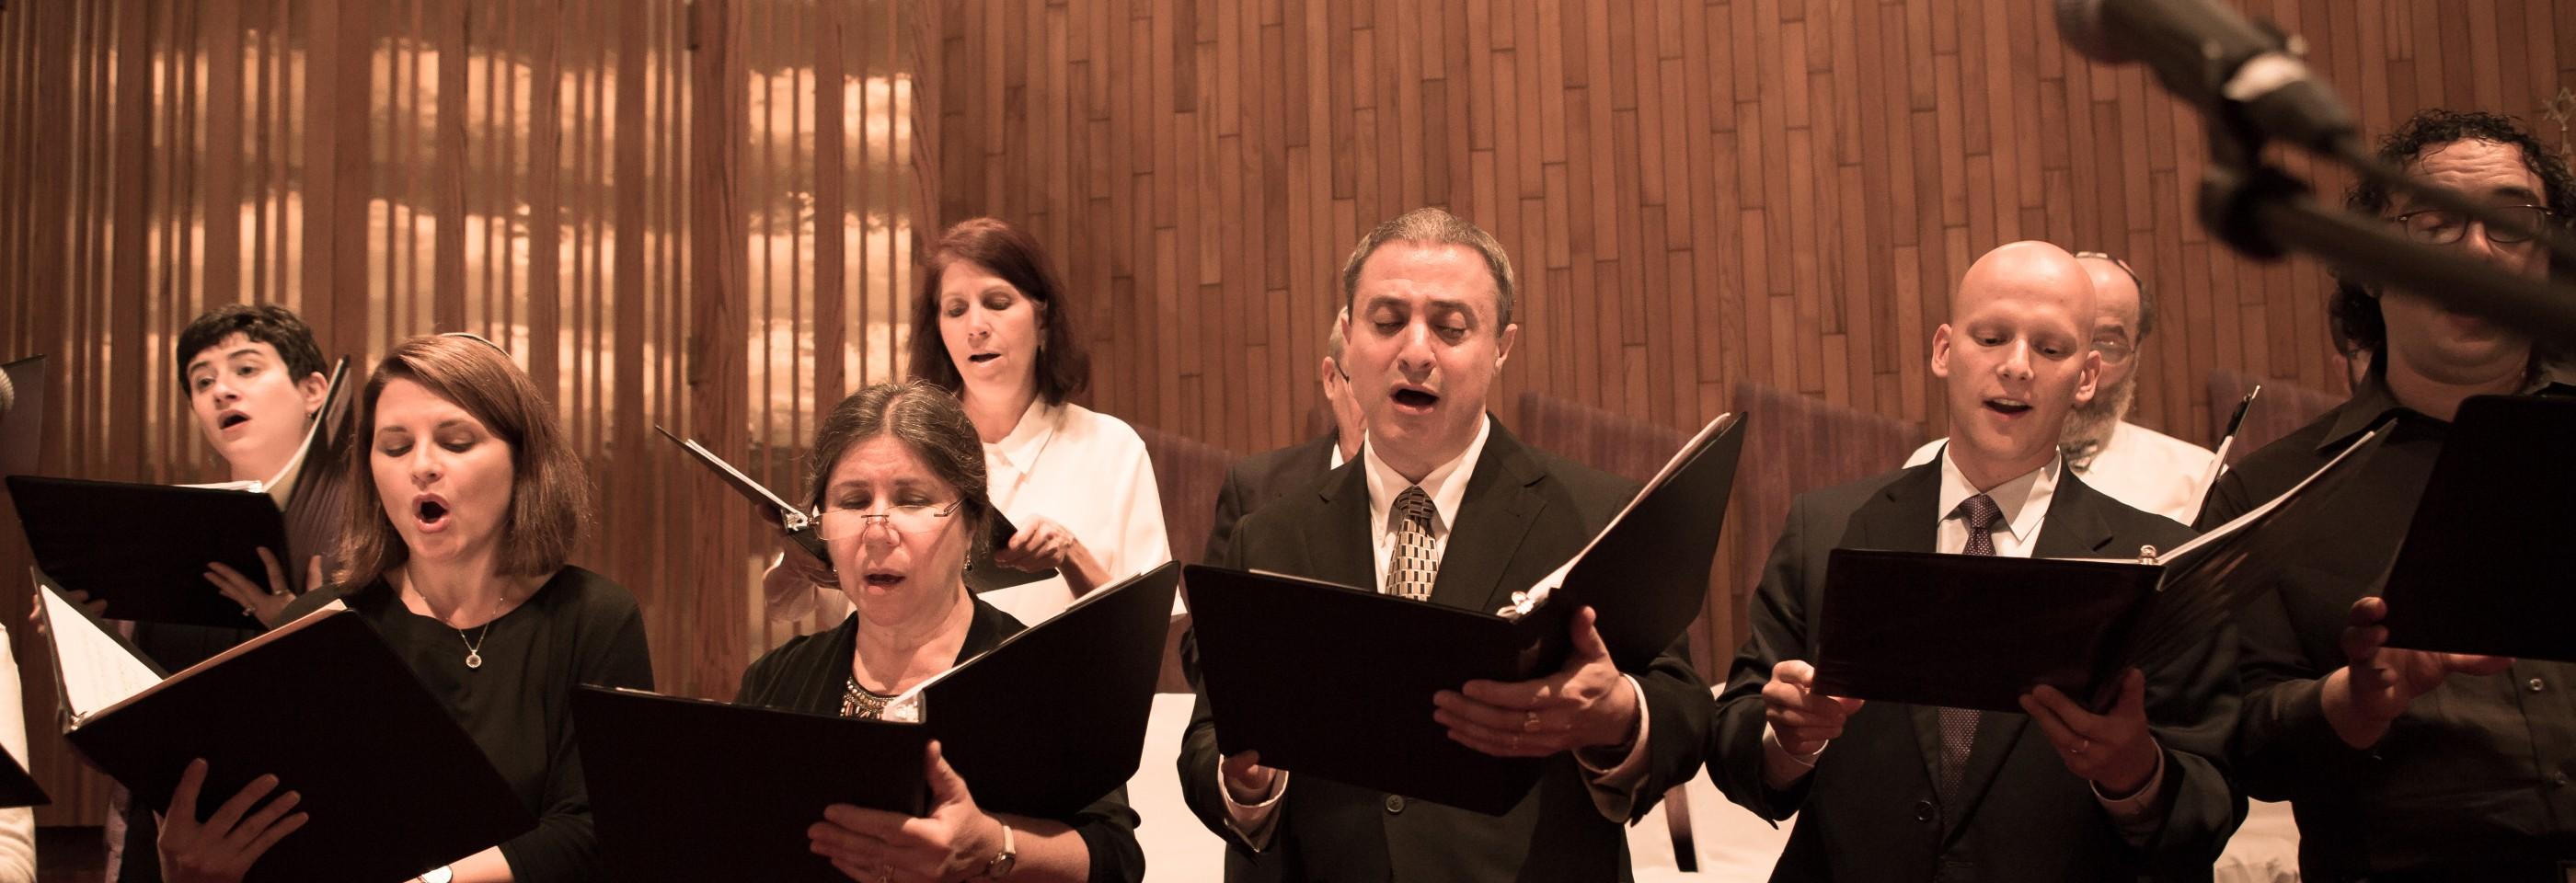 Cantors singing in a choir